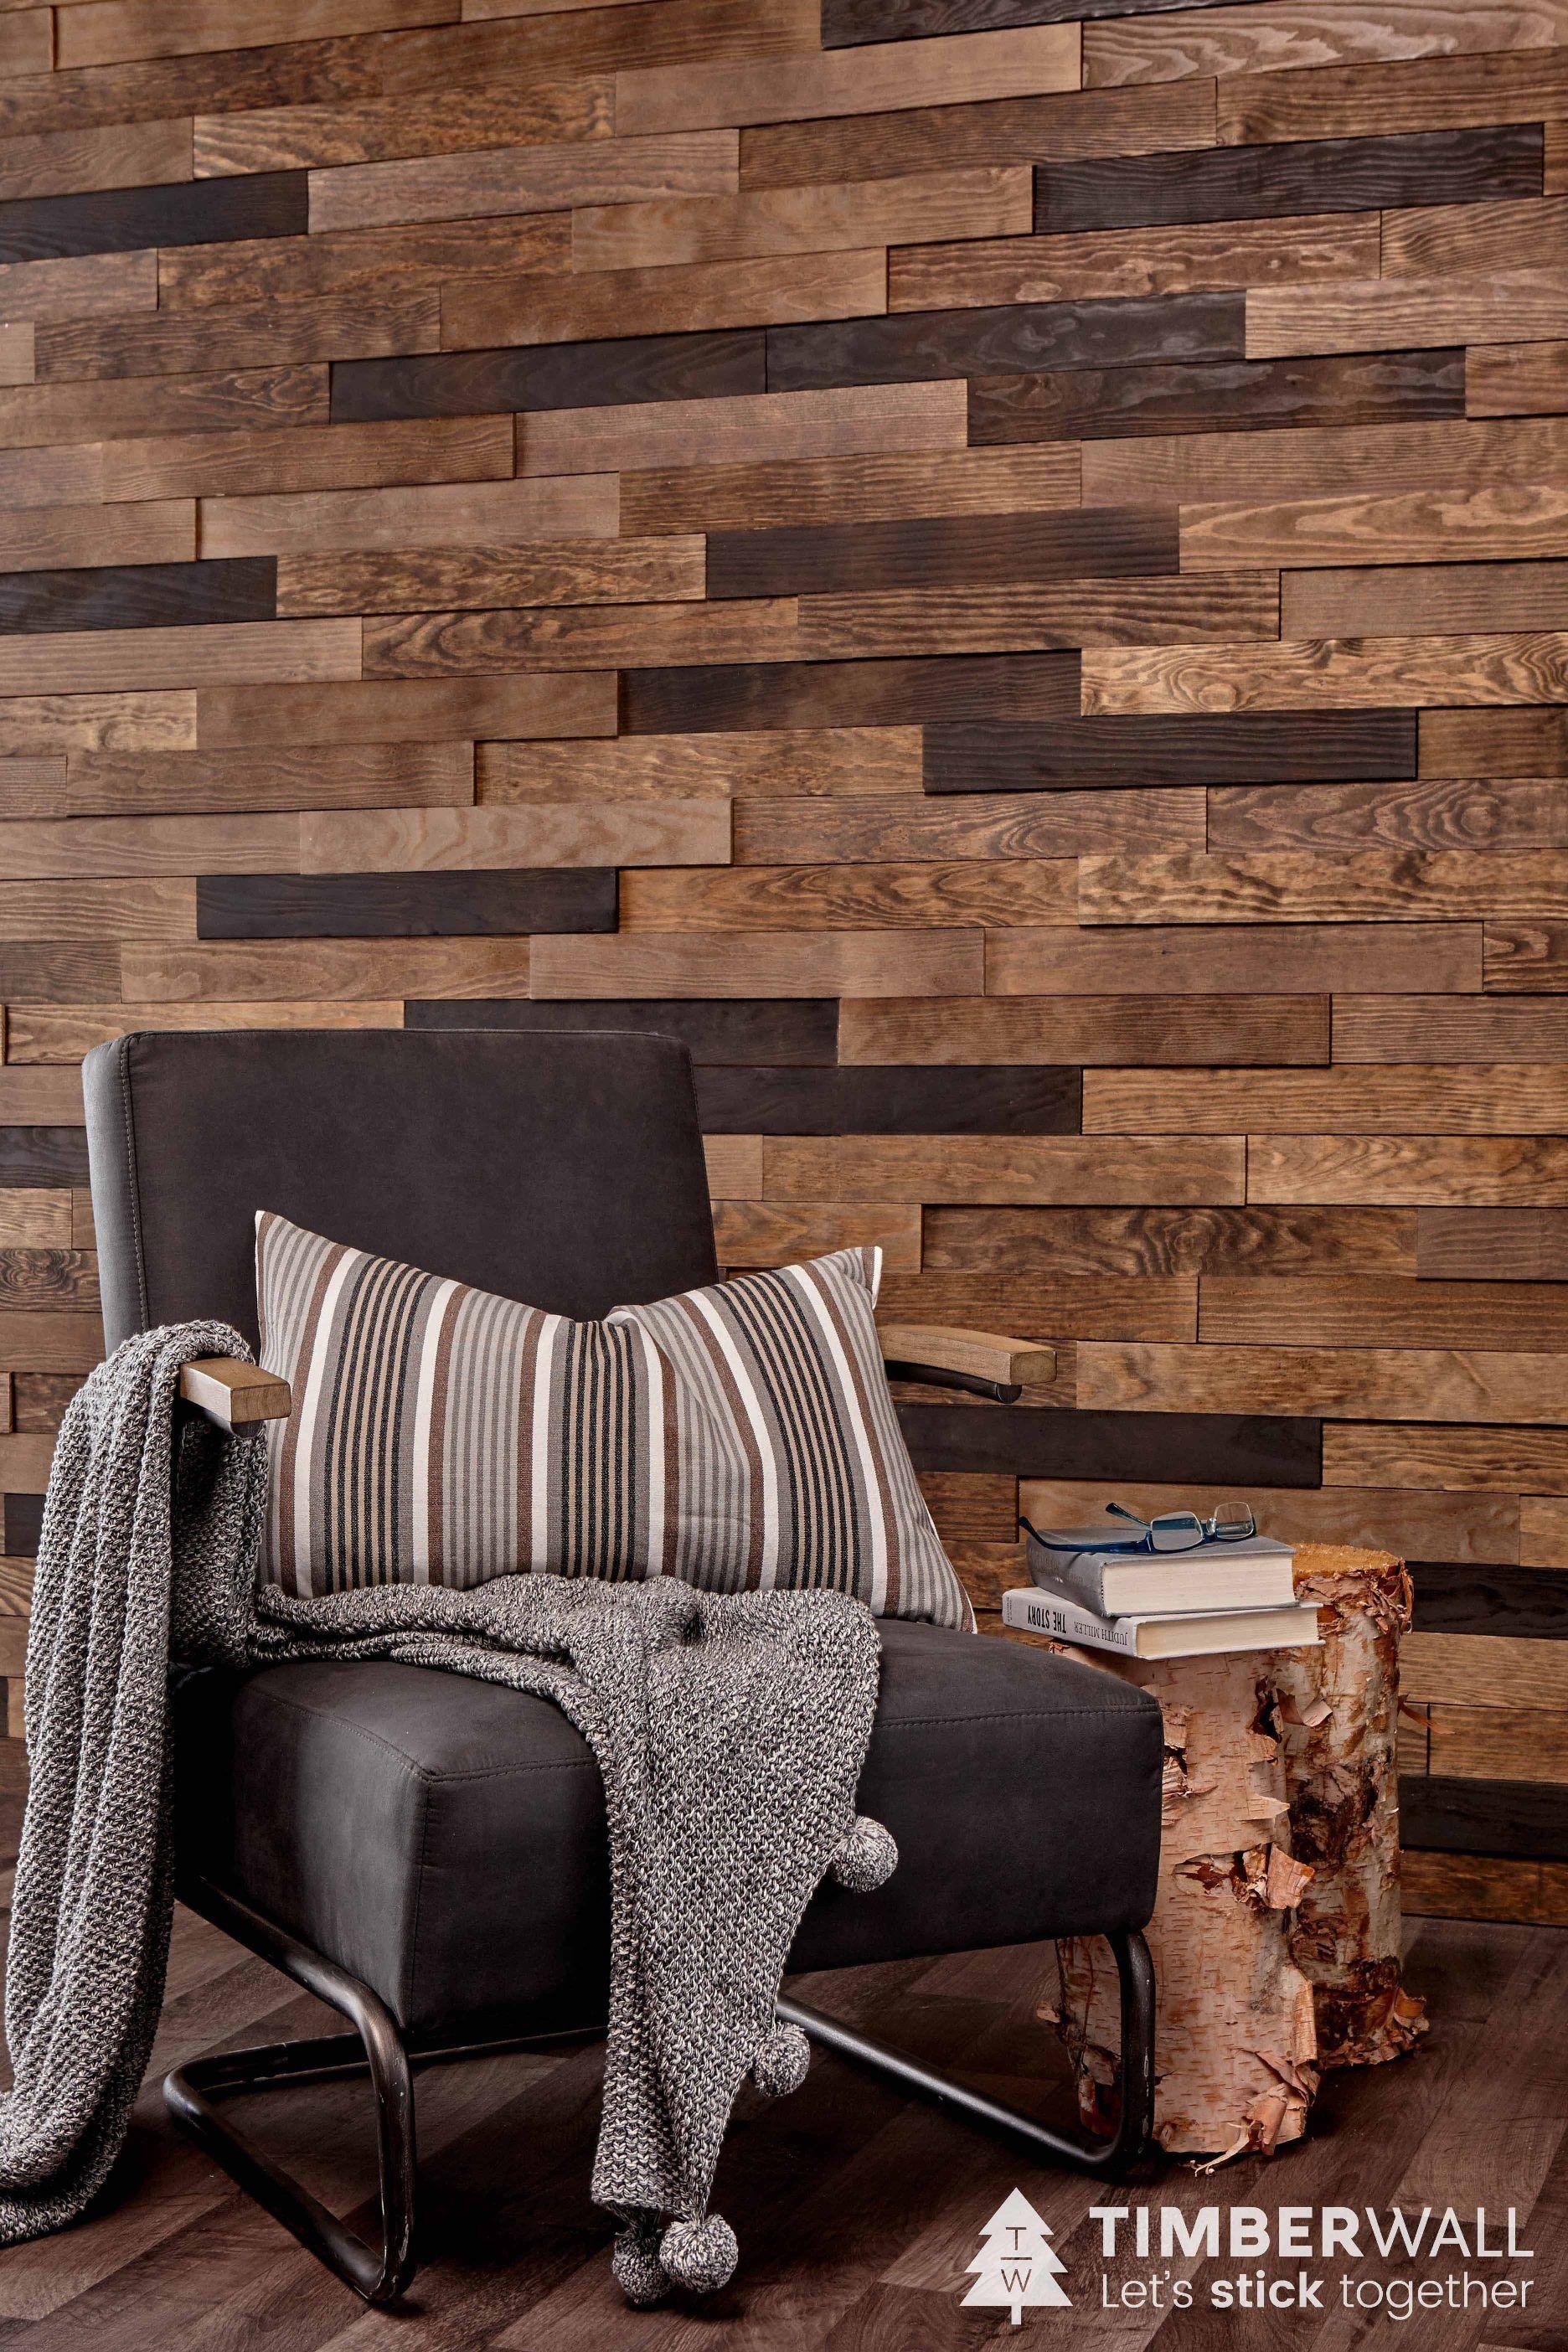 Pin By Timberwall Nz On Timberwall Range Wood Panel Walls Stick On Wood Wall Timber Walls